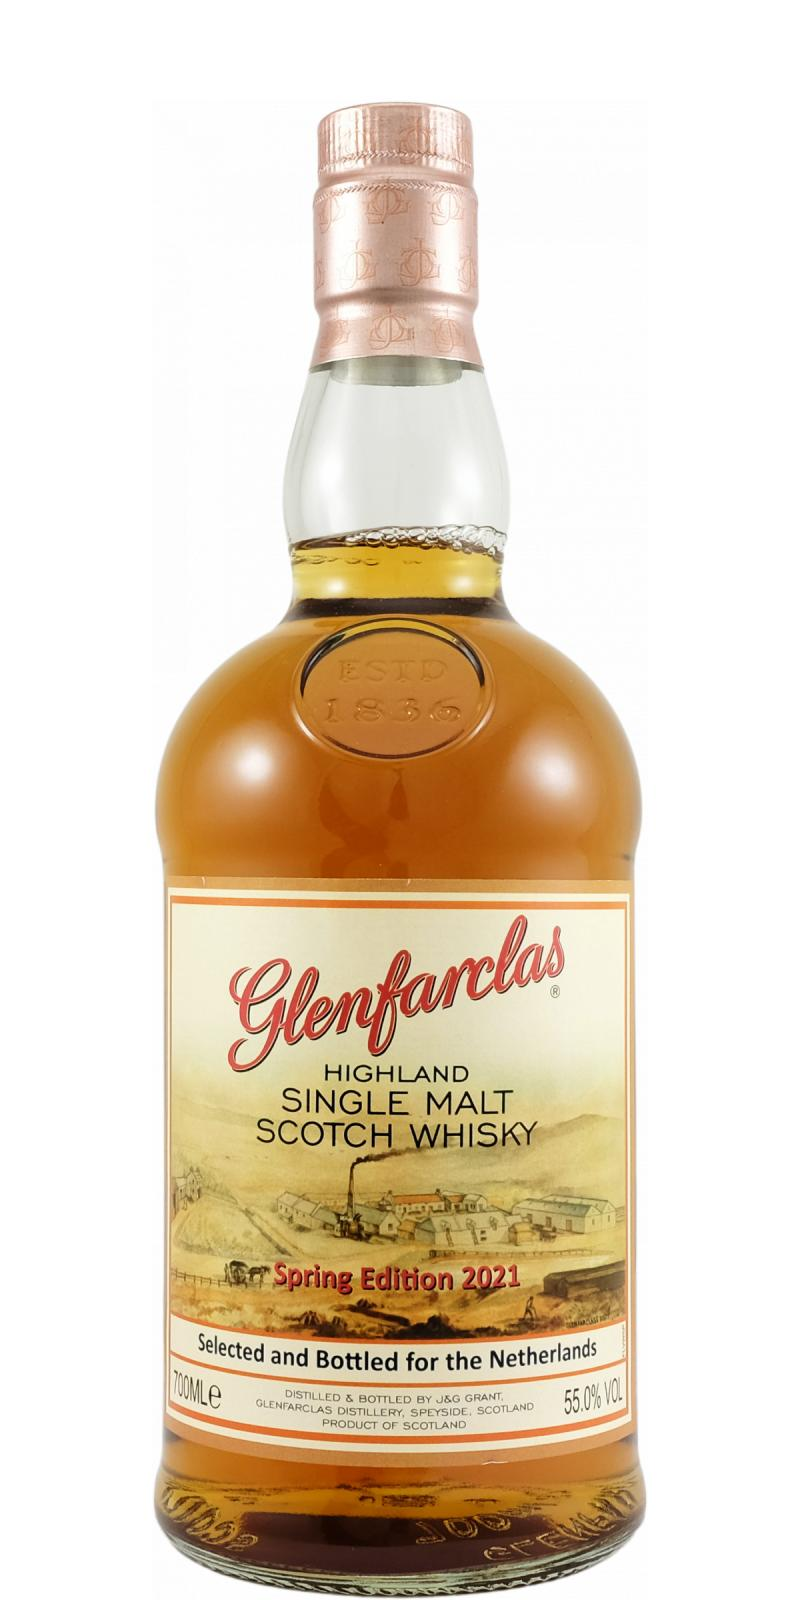 Glenfarclas Spring Edition 2021